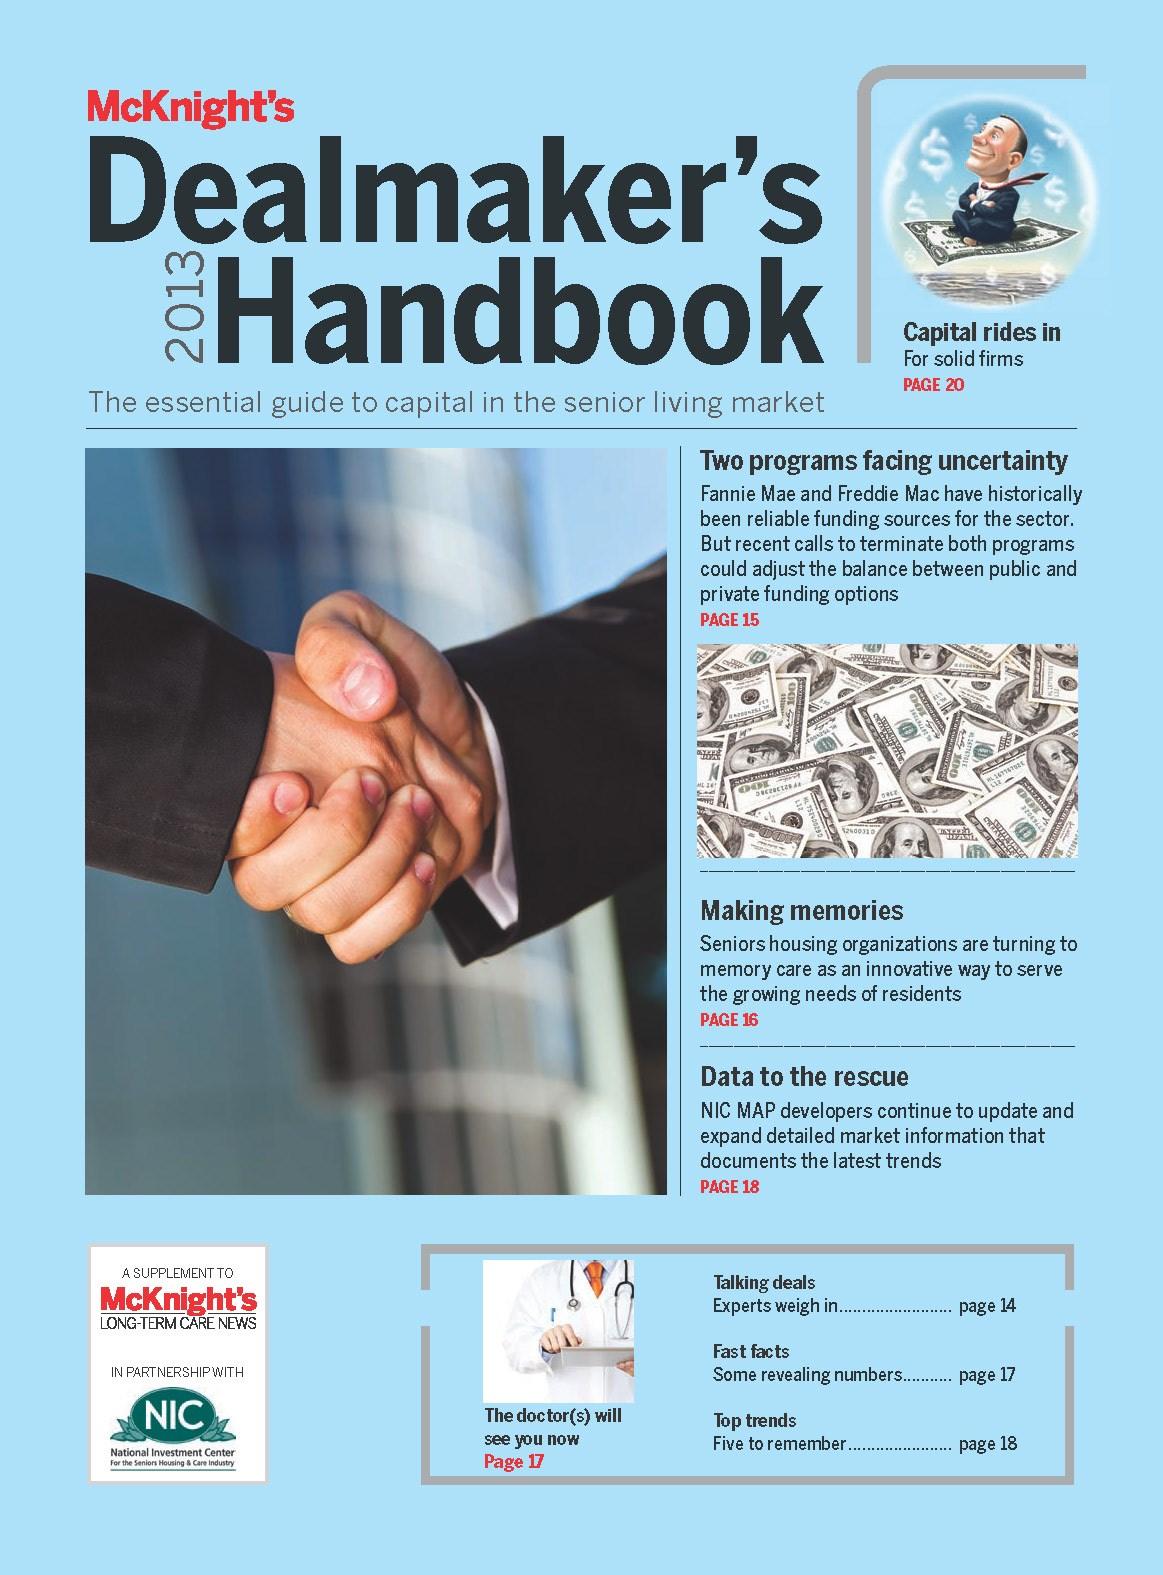 Dealmaker's Handbook 2013